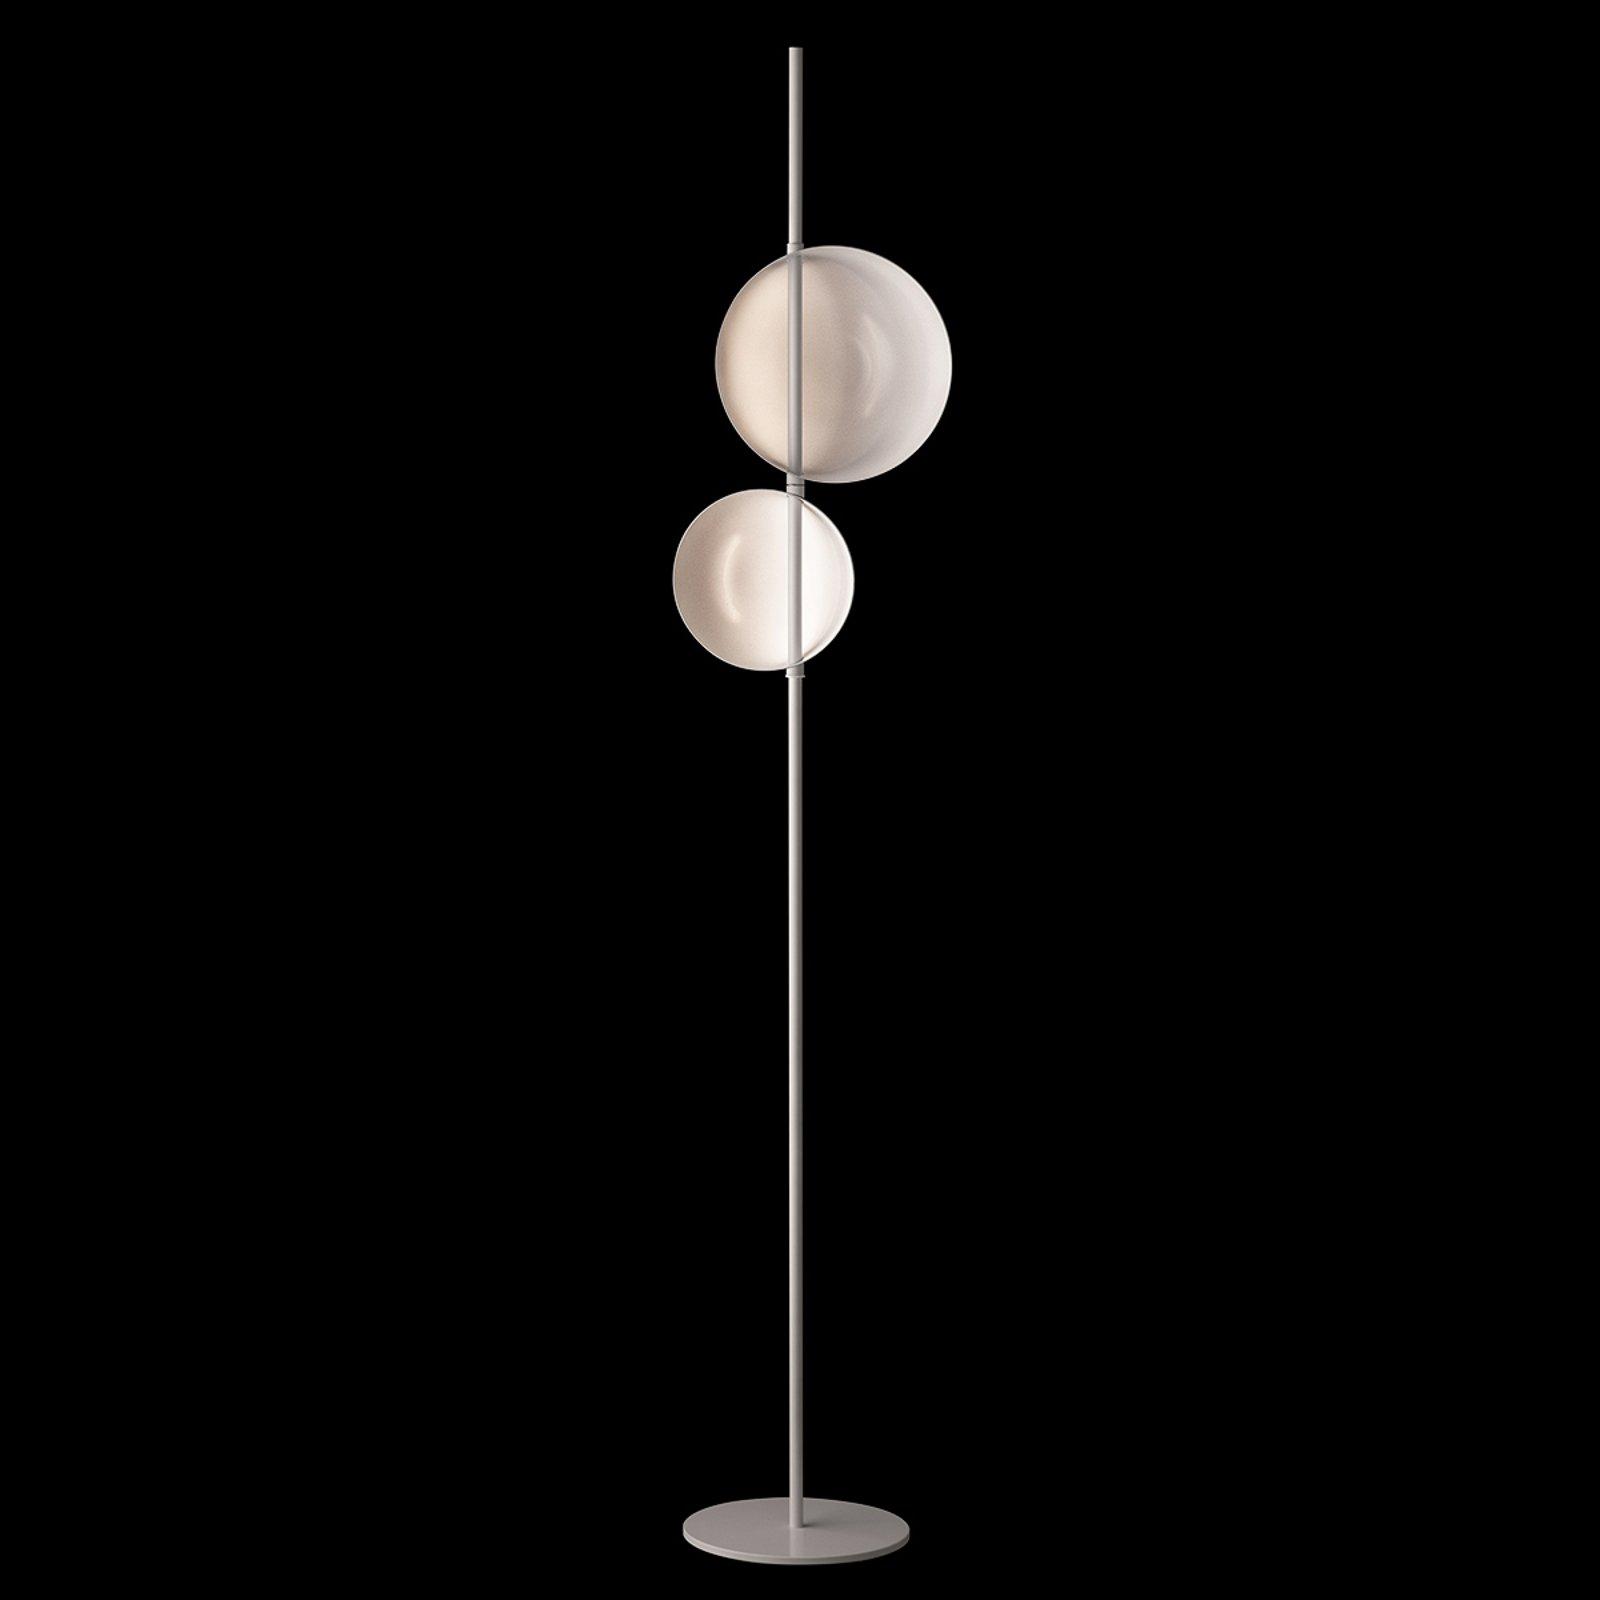 Oluce Superlana - designer-gulvlampe med LED-lys